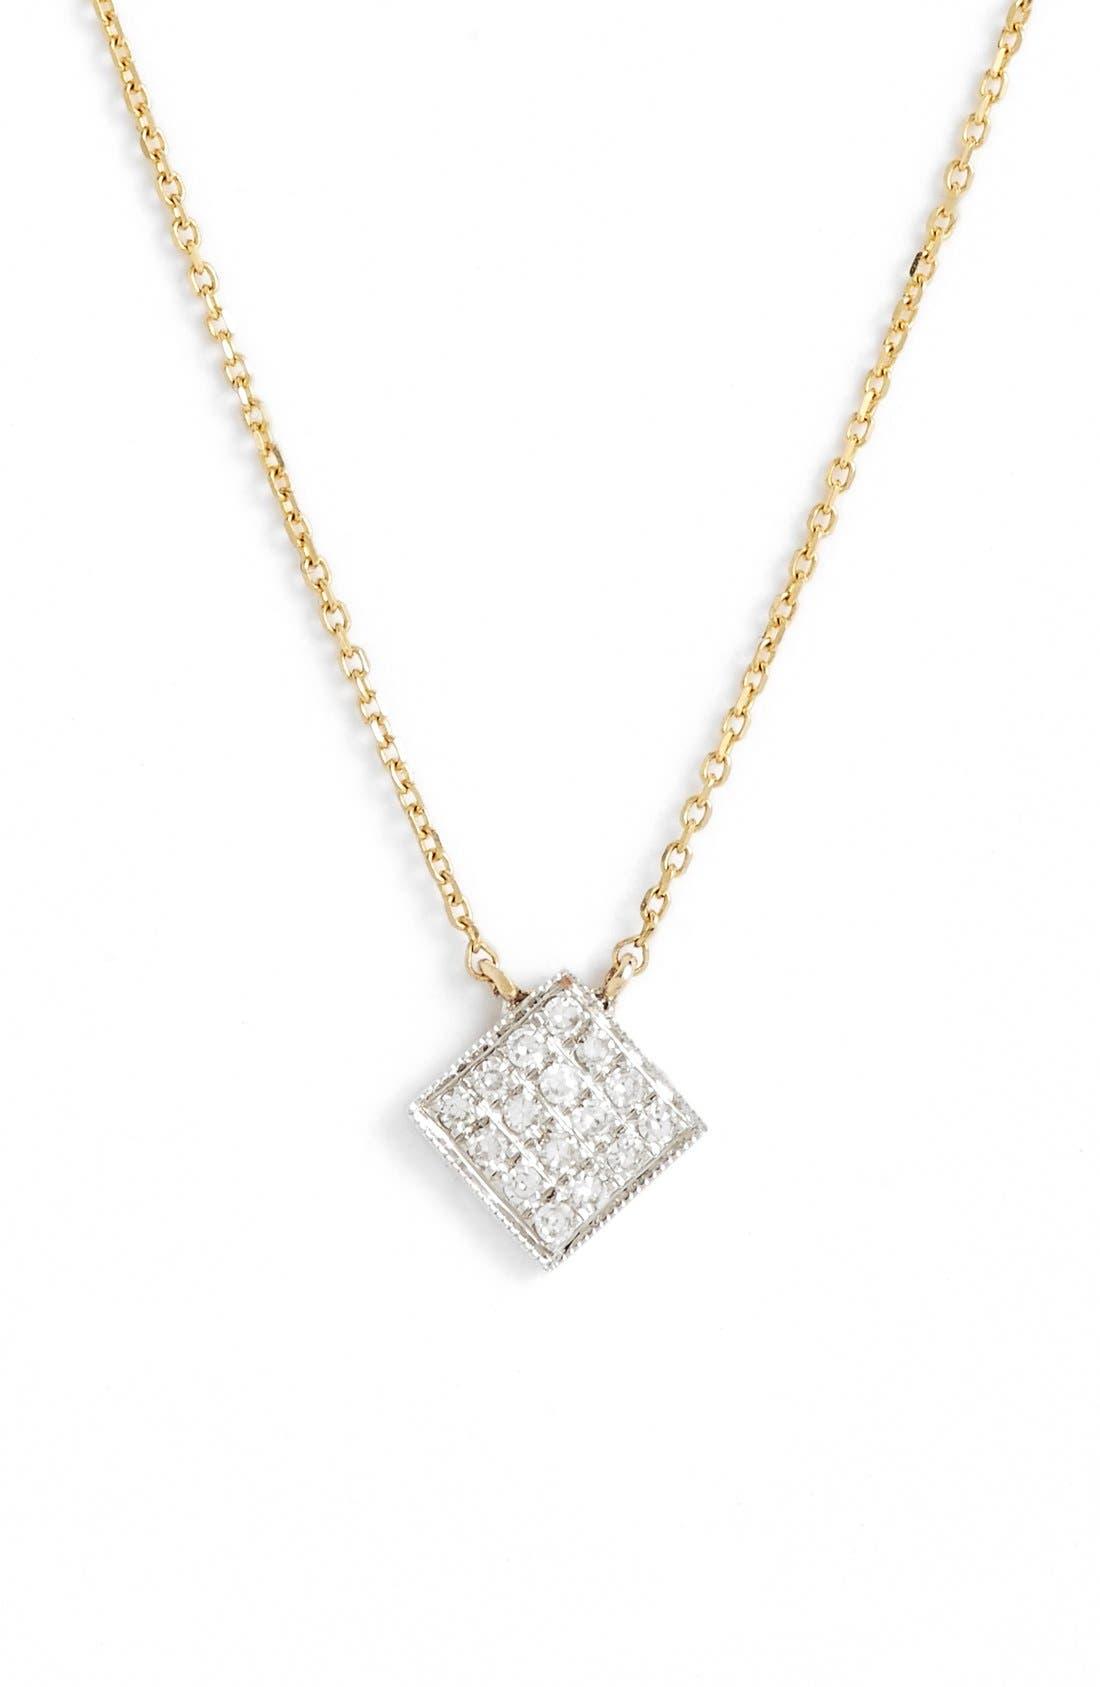 Main Image - Dana Rebecca Designs 'Lisa Michelle' Diamond Pavé Square Pendant Necklace (Nordstrom Exclusive)